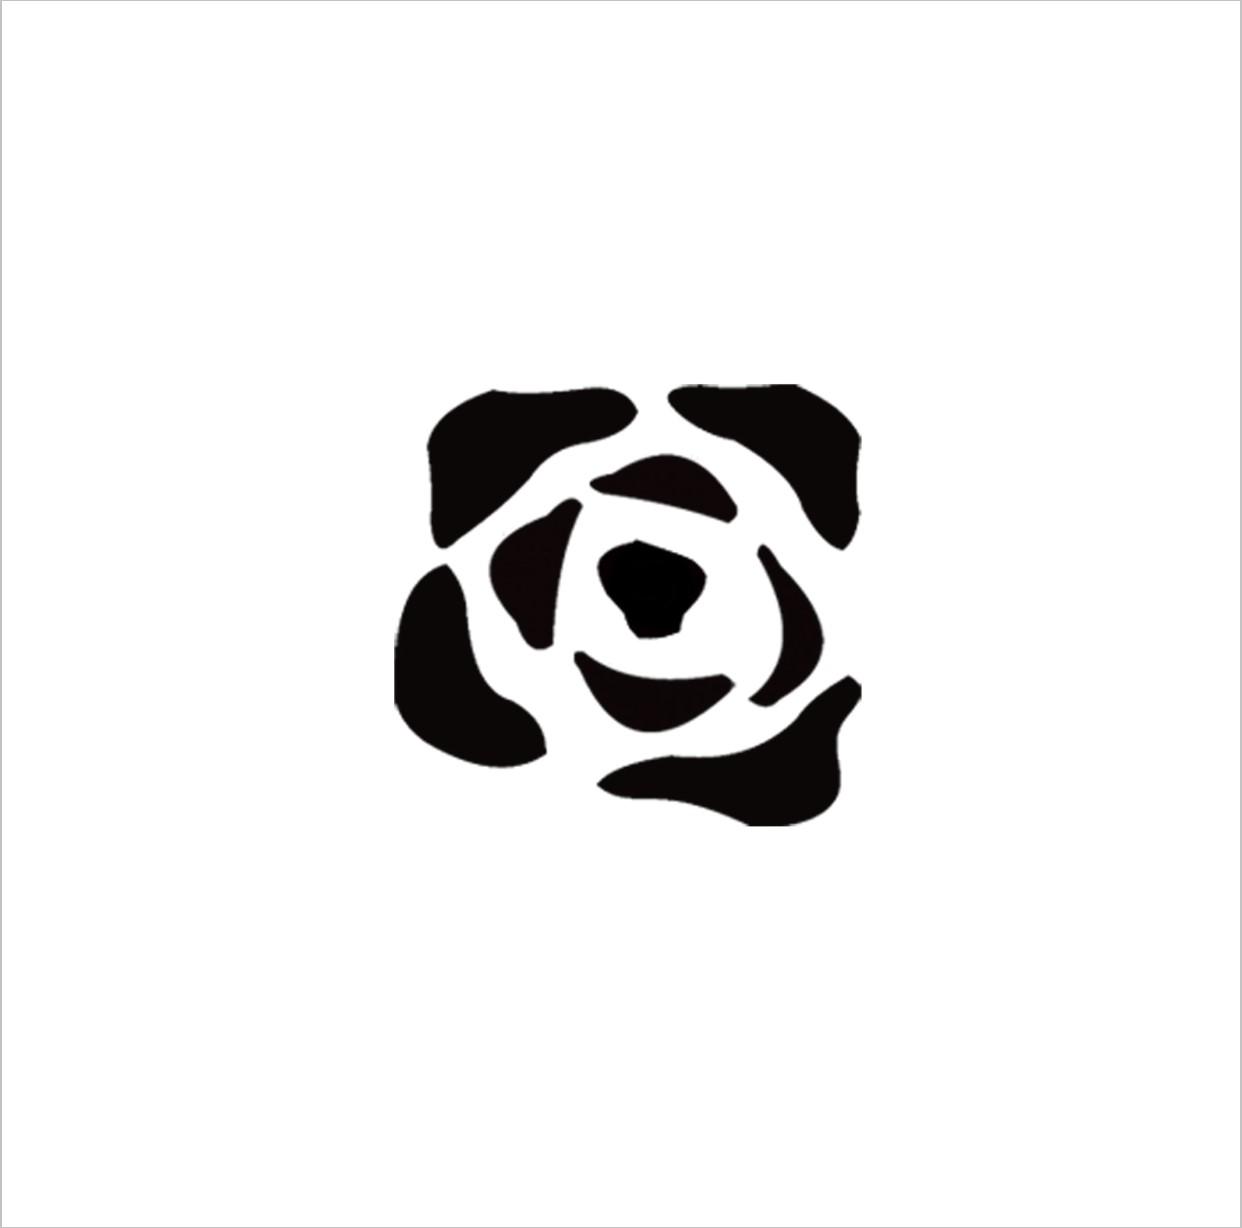 Rose Professional Stencil Insert (small)